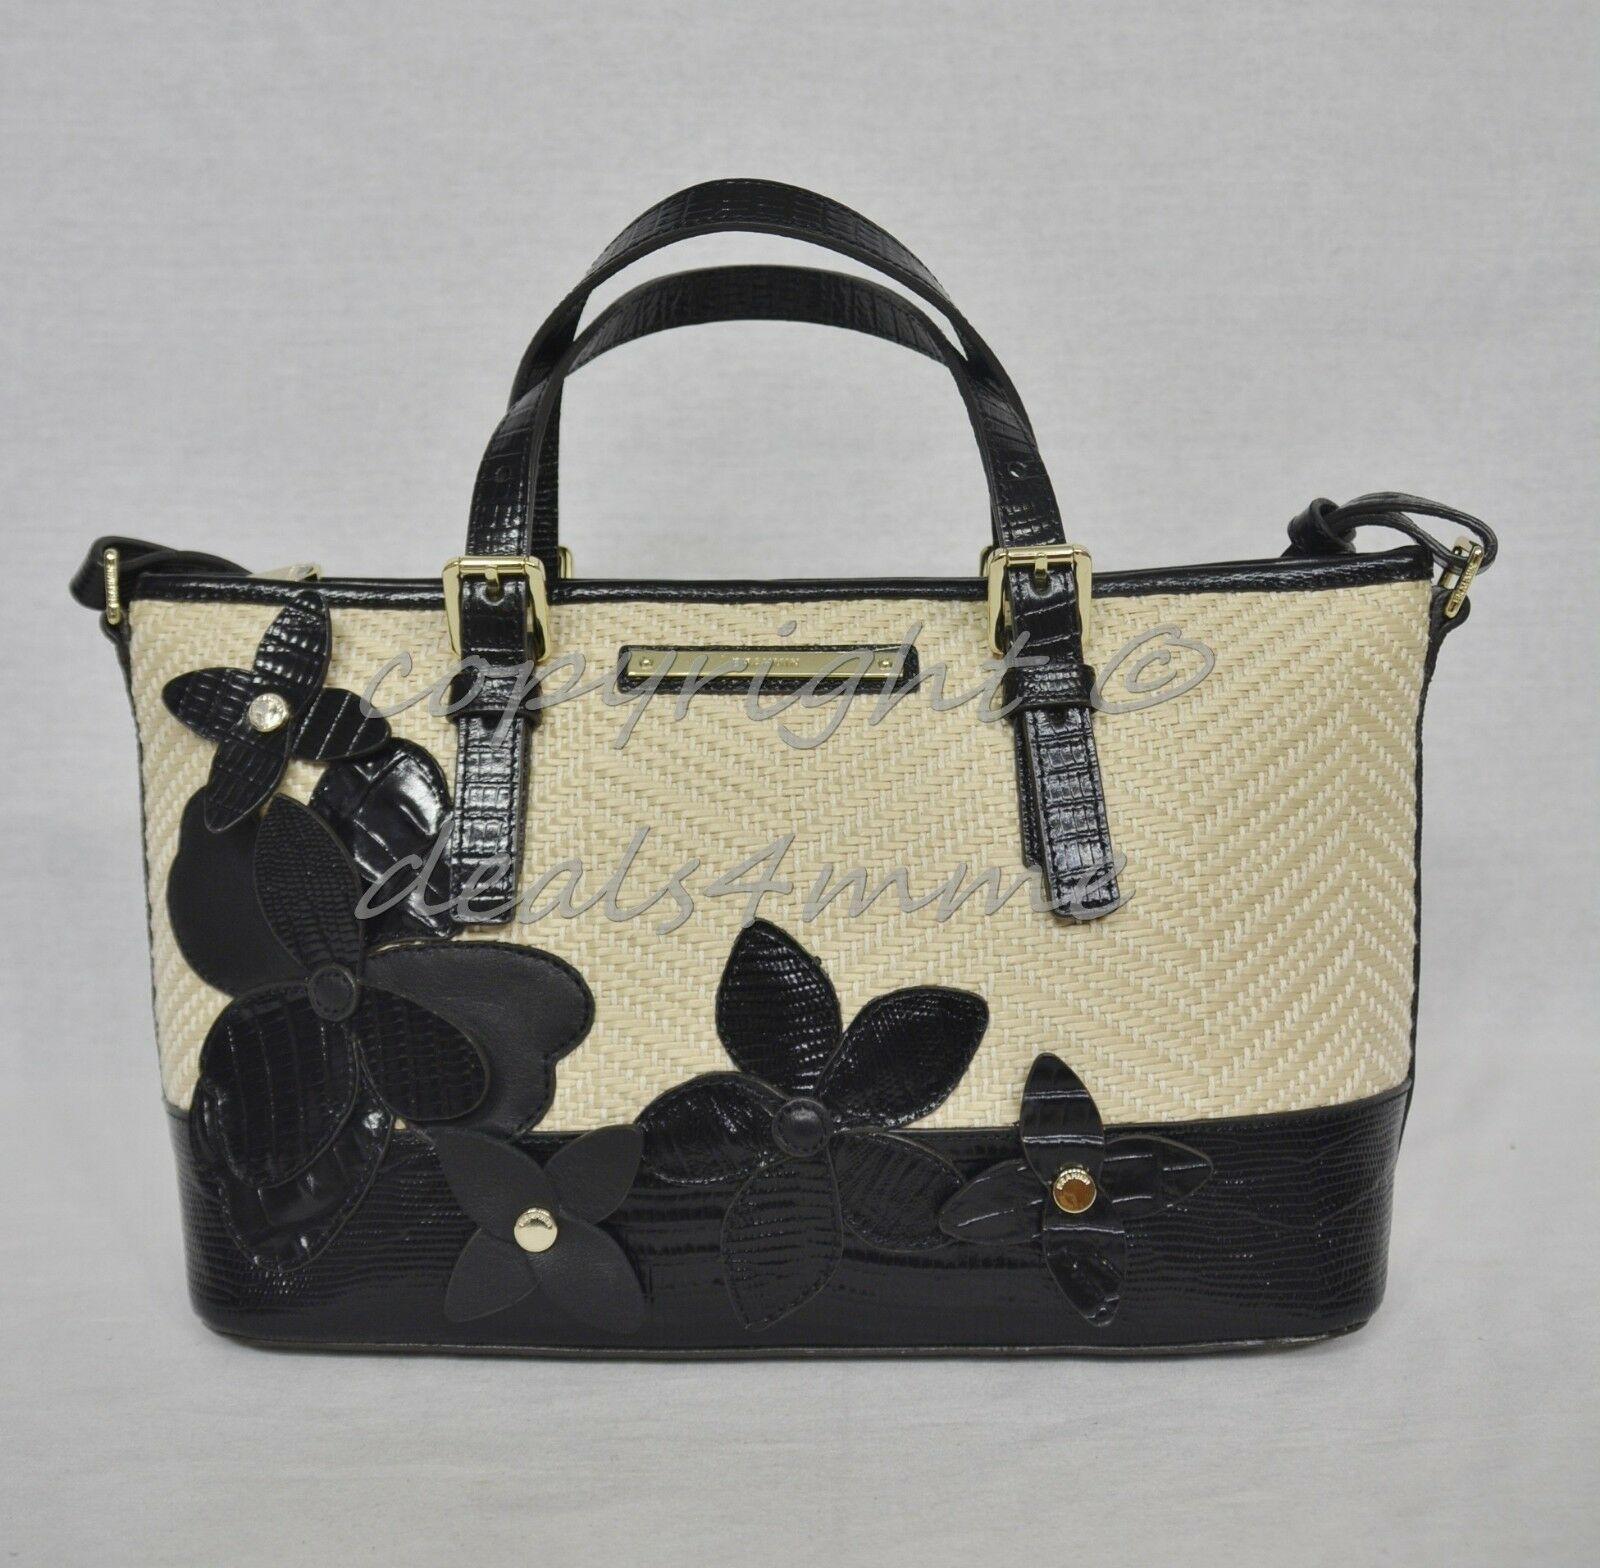 NWT Brahmin Mini Asher Satchel/Shoulder Bag in Black Miramonte-Cream with Black image 4